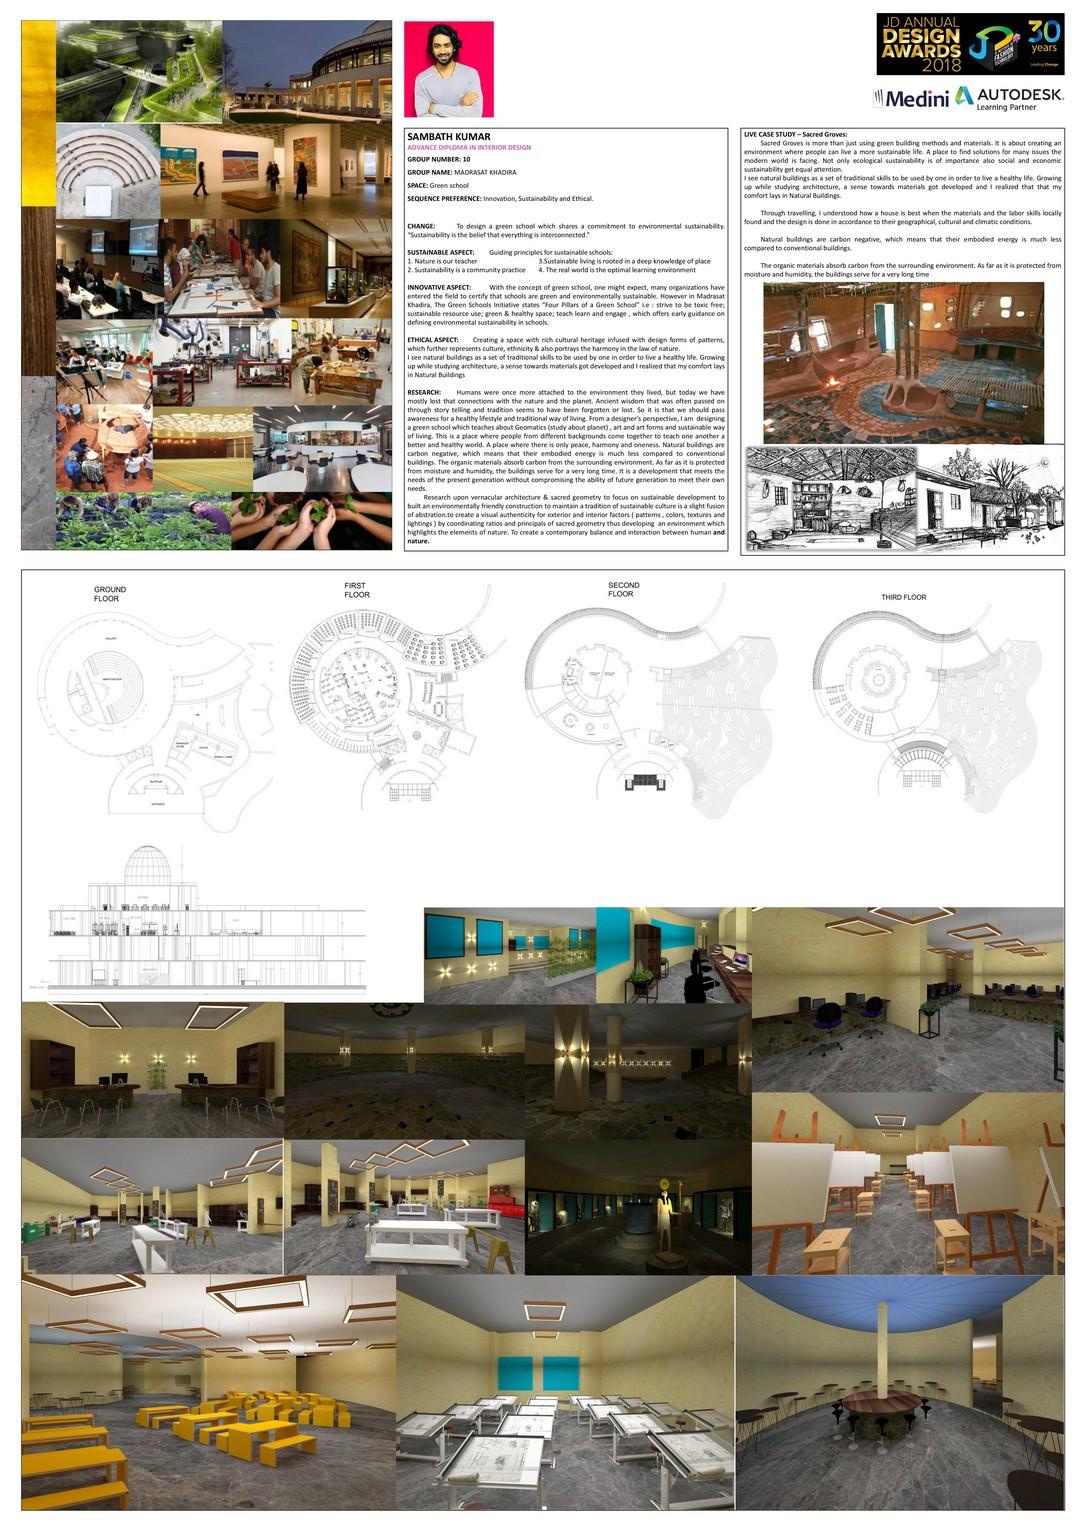 Madrasat Khadira – Change – JD Annual Design Awards 2018   Designer: Sambath Kumar   Photography : Jerin Nath (@jerin_nath) madrasat khadira Madrasat Khadira – Change – JD Annual Design Awards 2018 Madrasat Khadira1